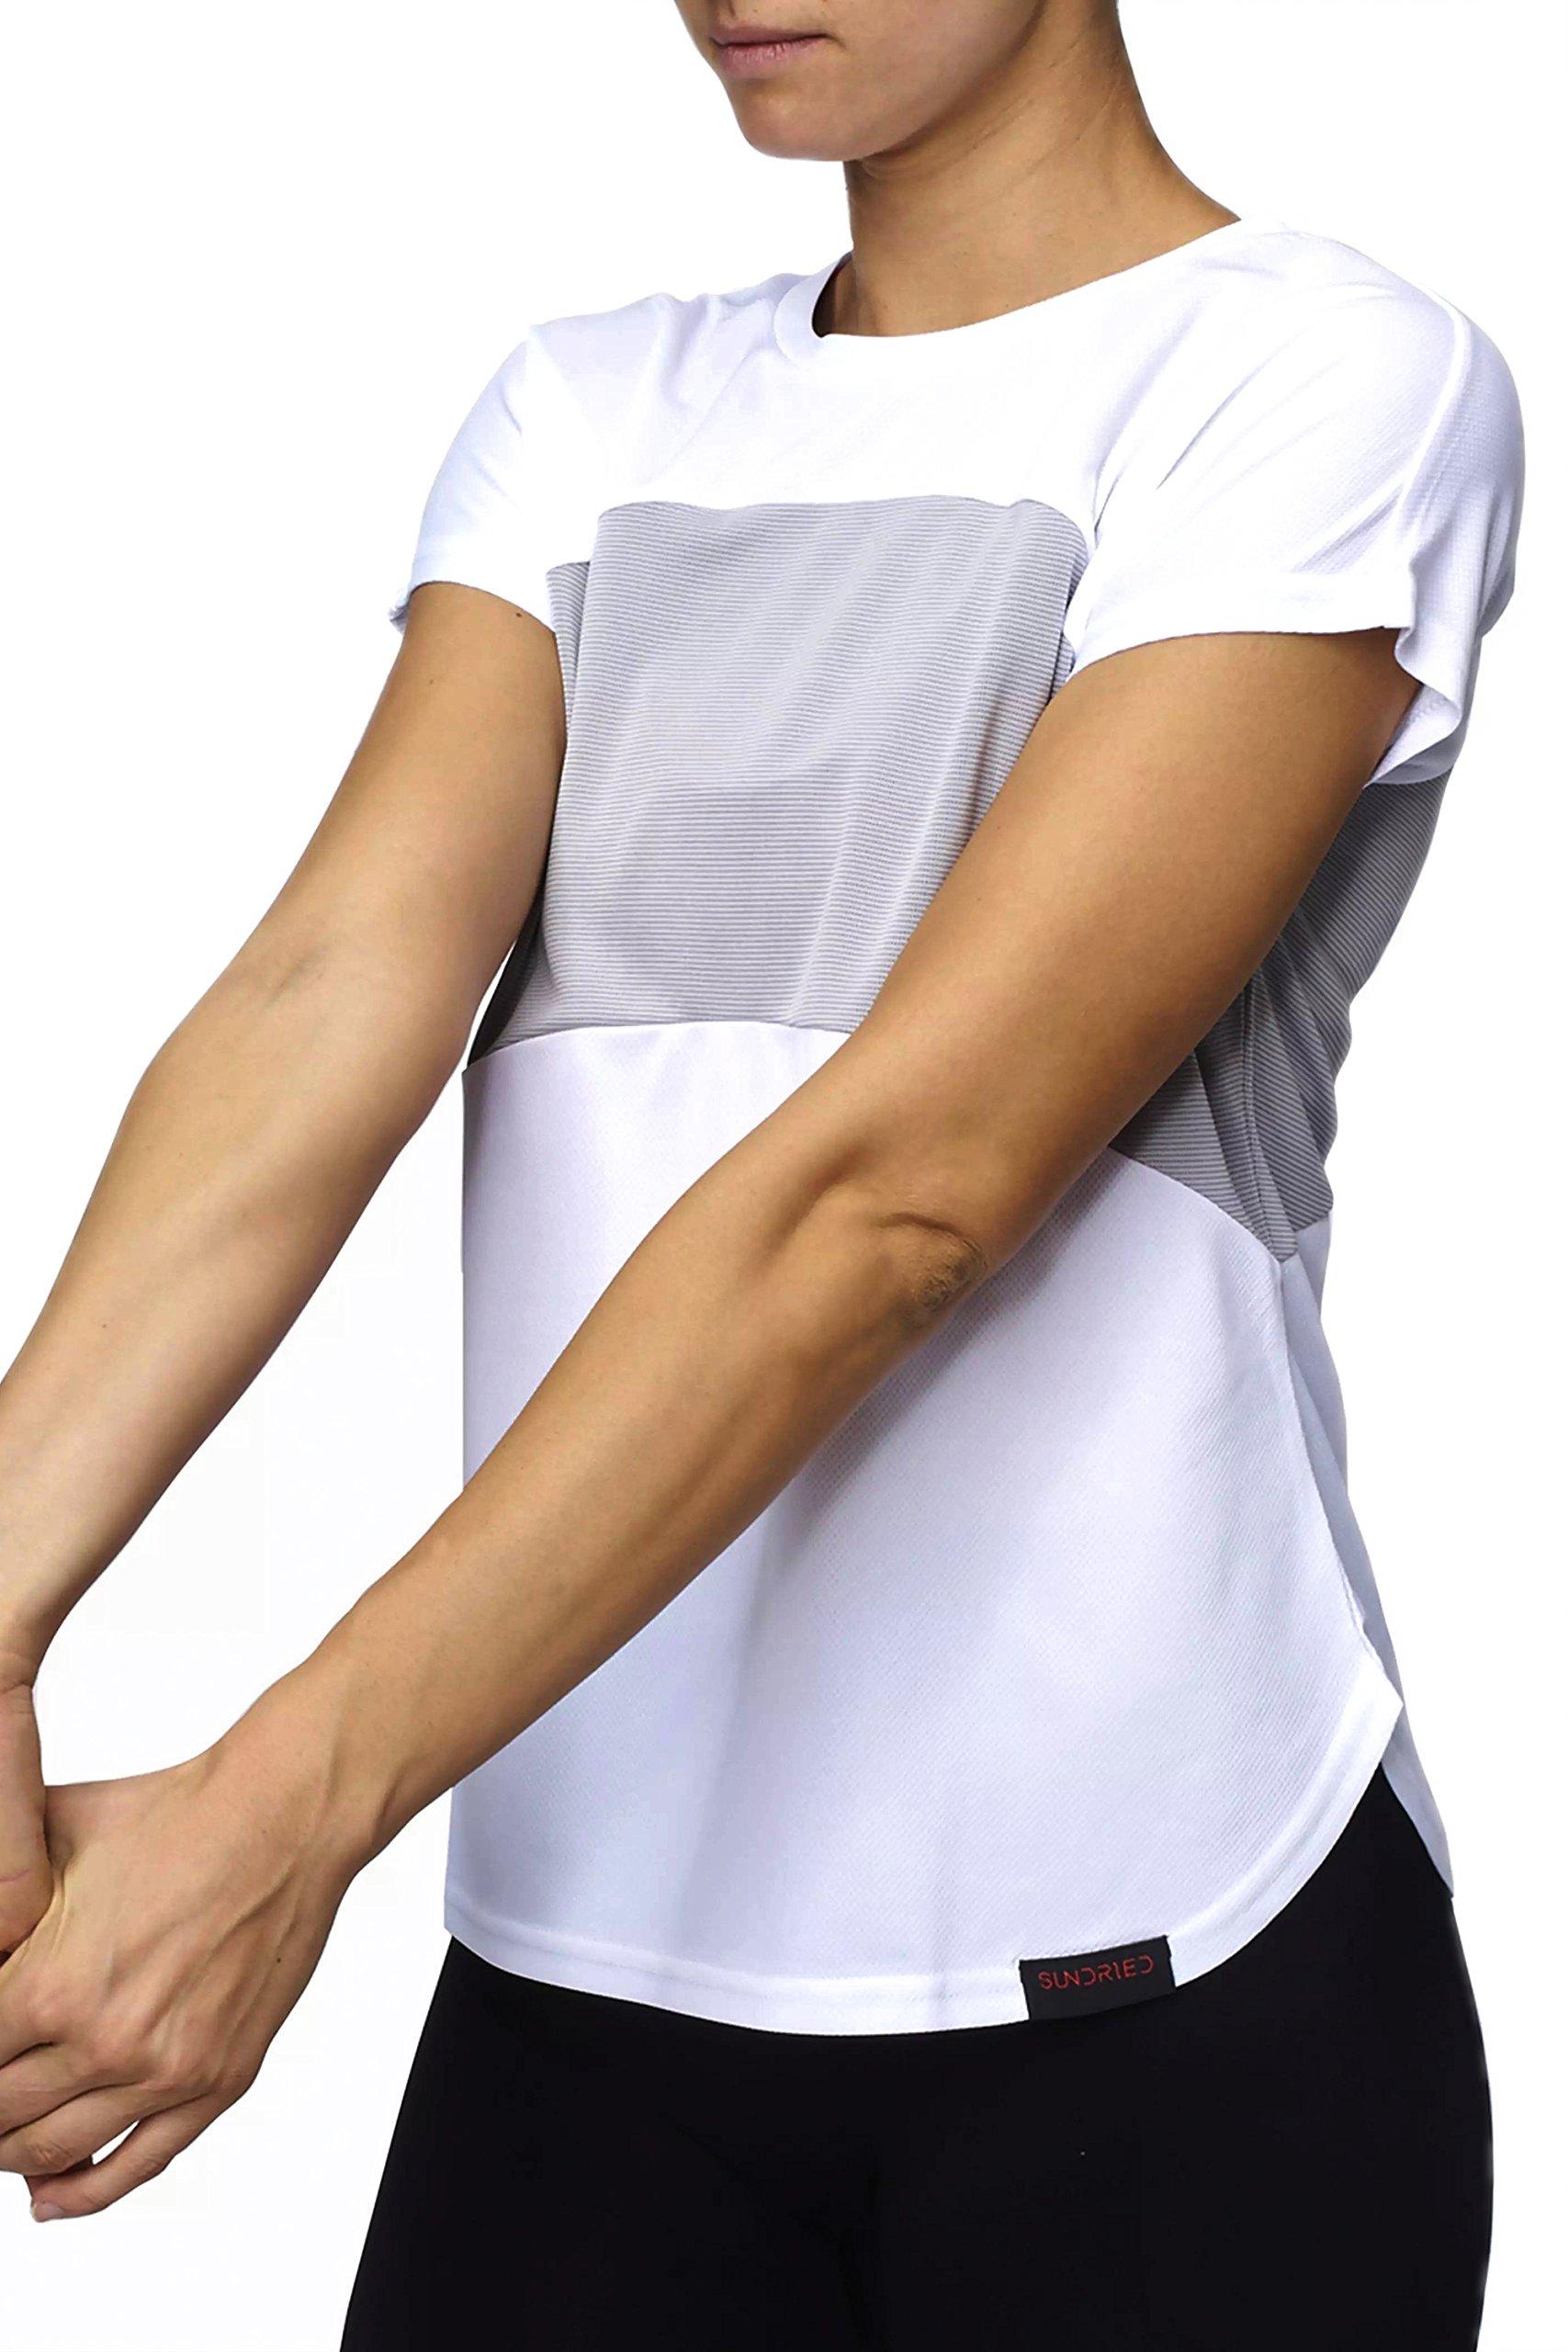 Sundried Camisa para Mujeres para Entrenamiento y Running Ropa de Gimnasio para Mujeres product image